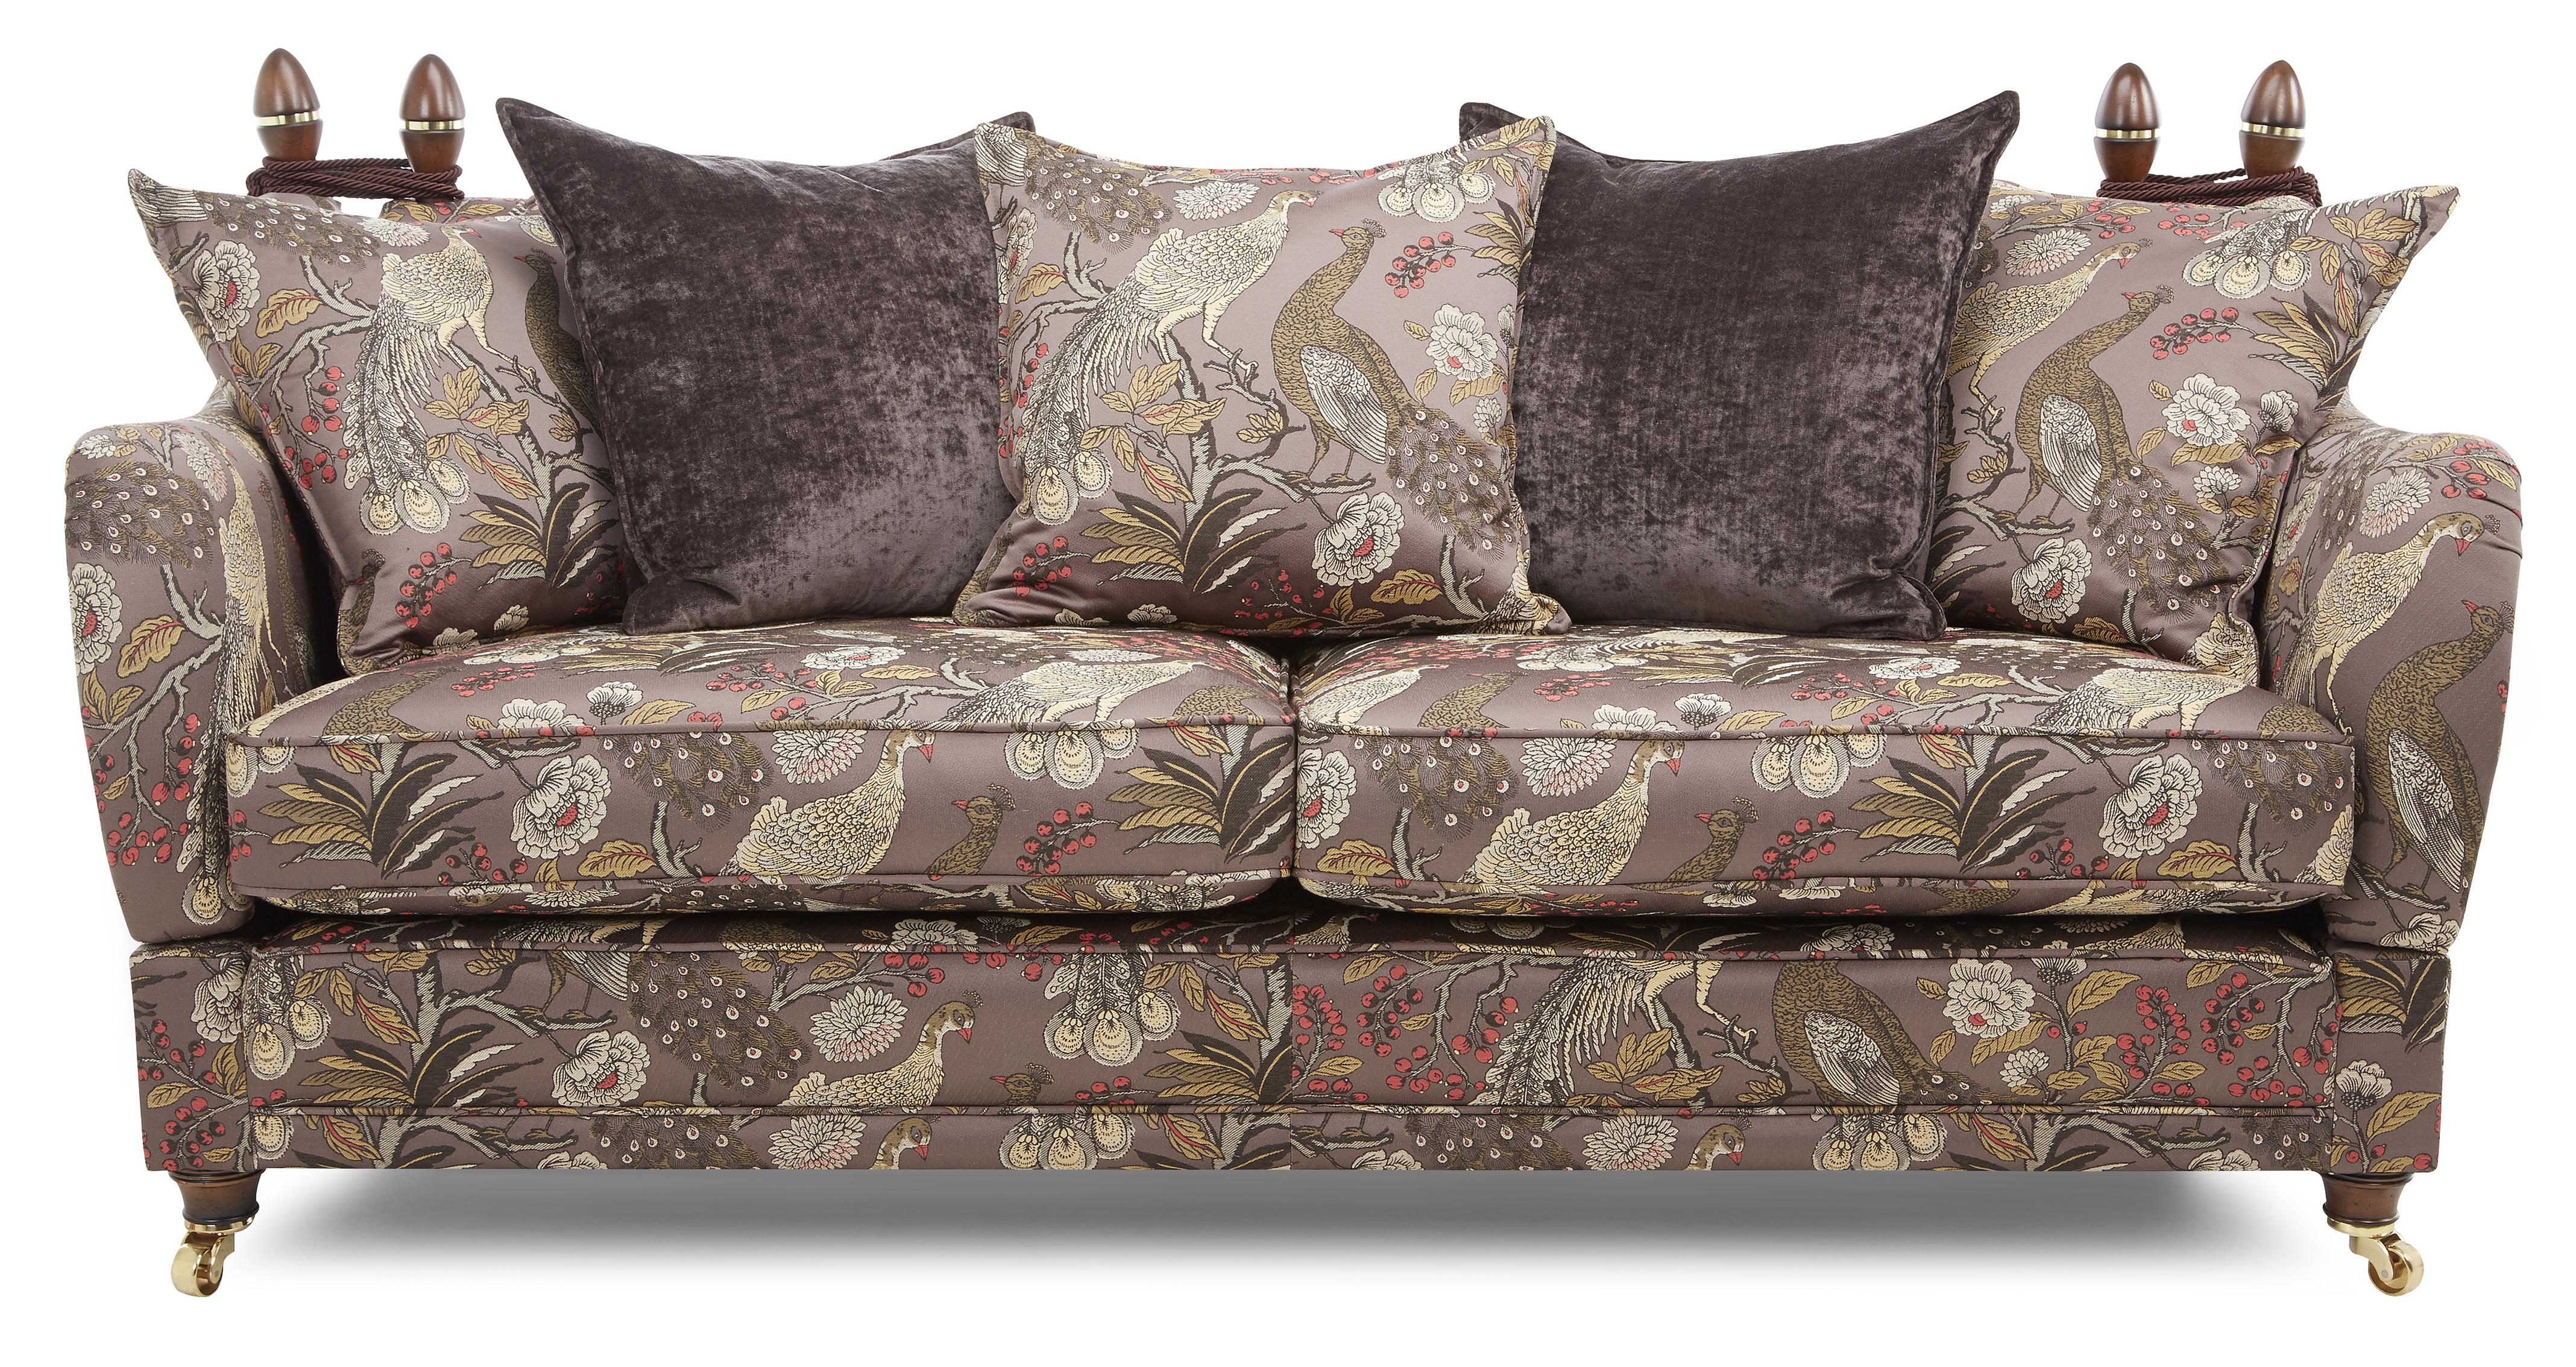 patterned sofas uk custom leather sofa north carolina morris 4 seater pattern pillow back dfs ireland